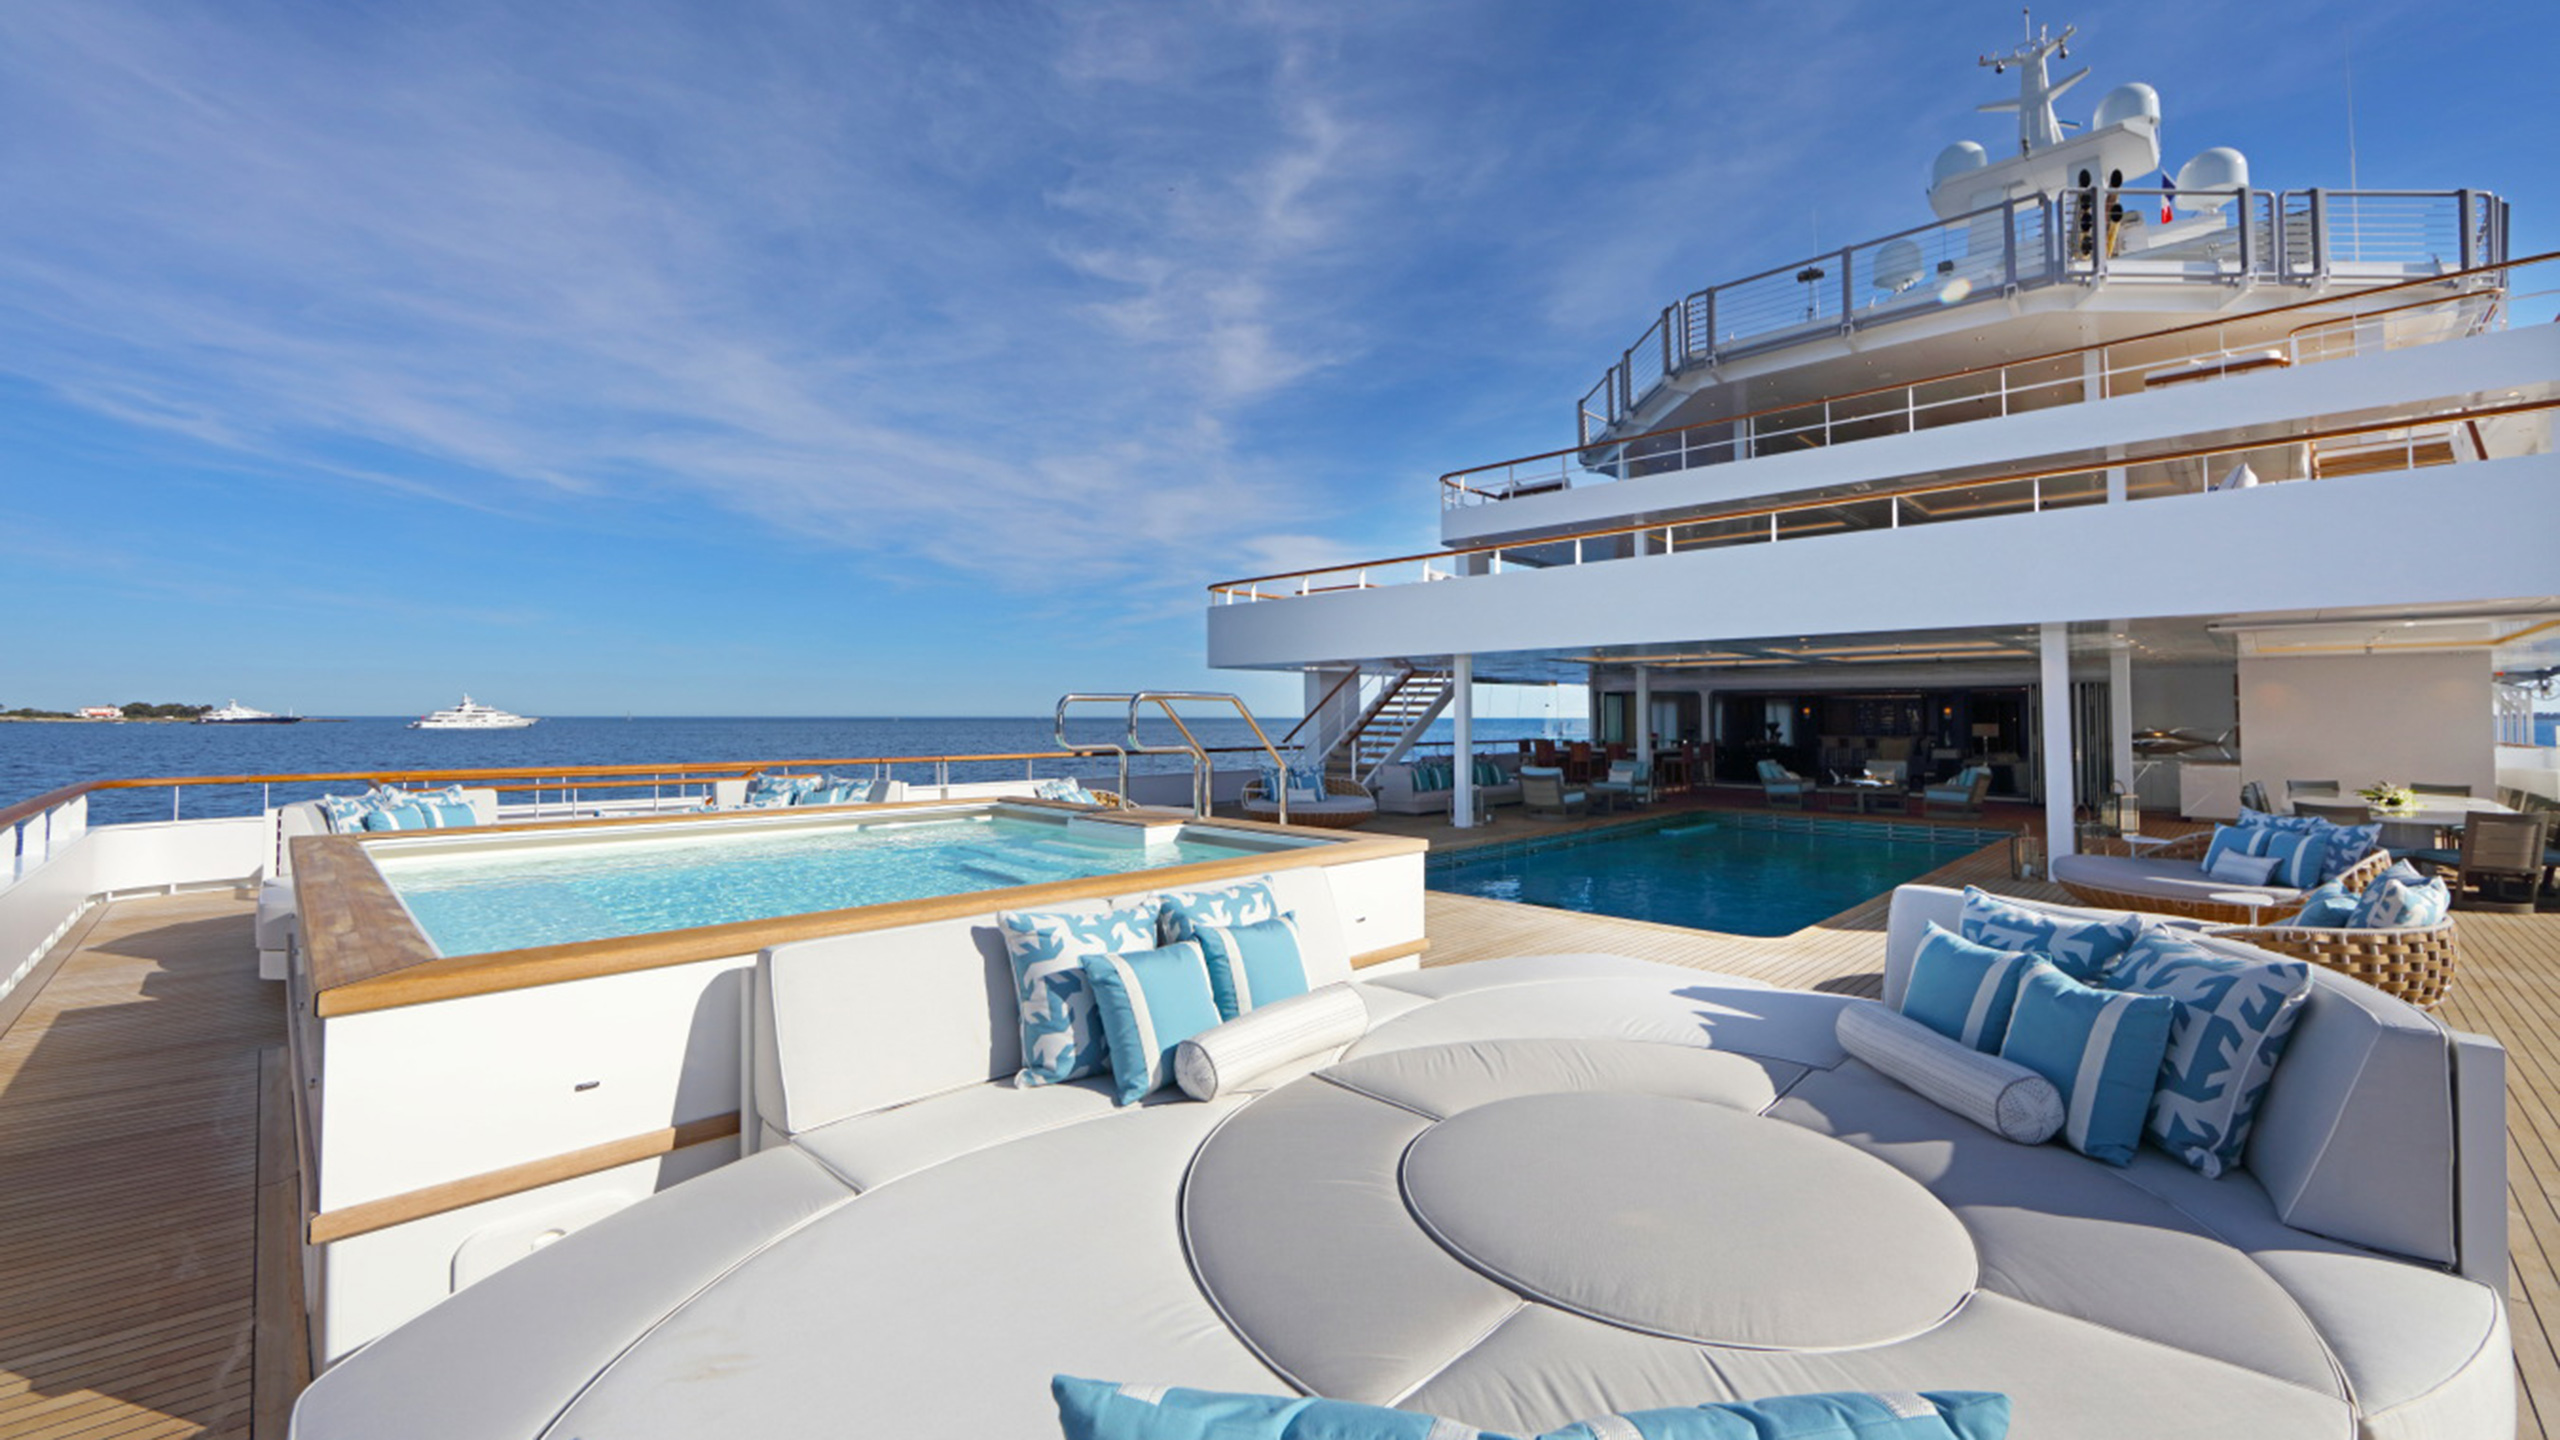 the-pool-deck-of-kleven-explorer-yacht-ulysses